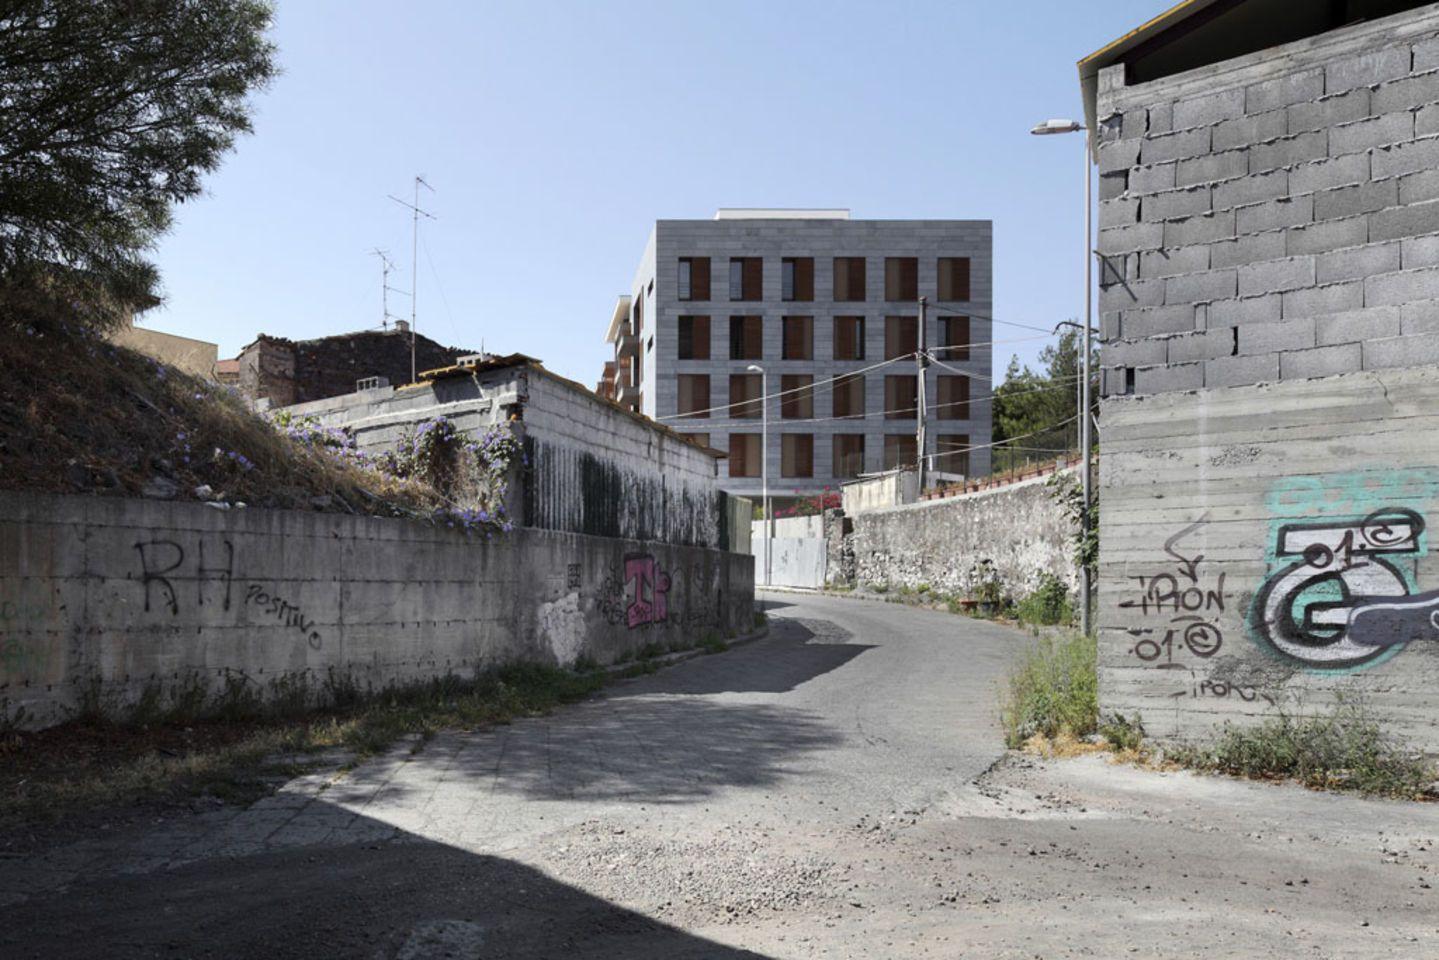 Bruno messina vincenzo schilir studio associato peppe for Studio architettura catania